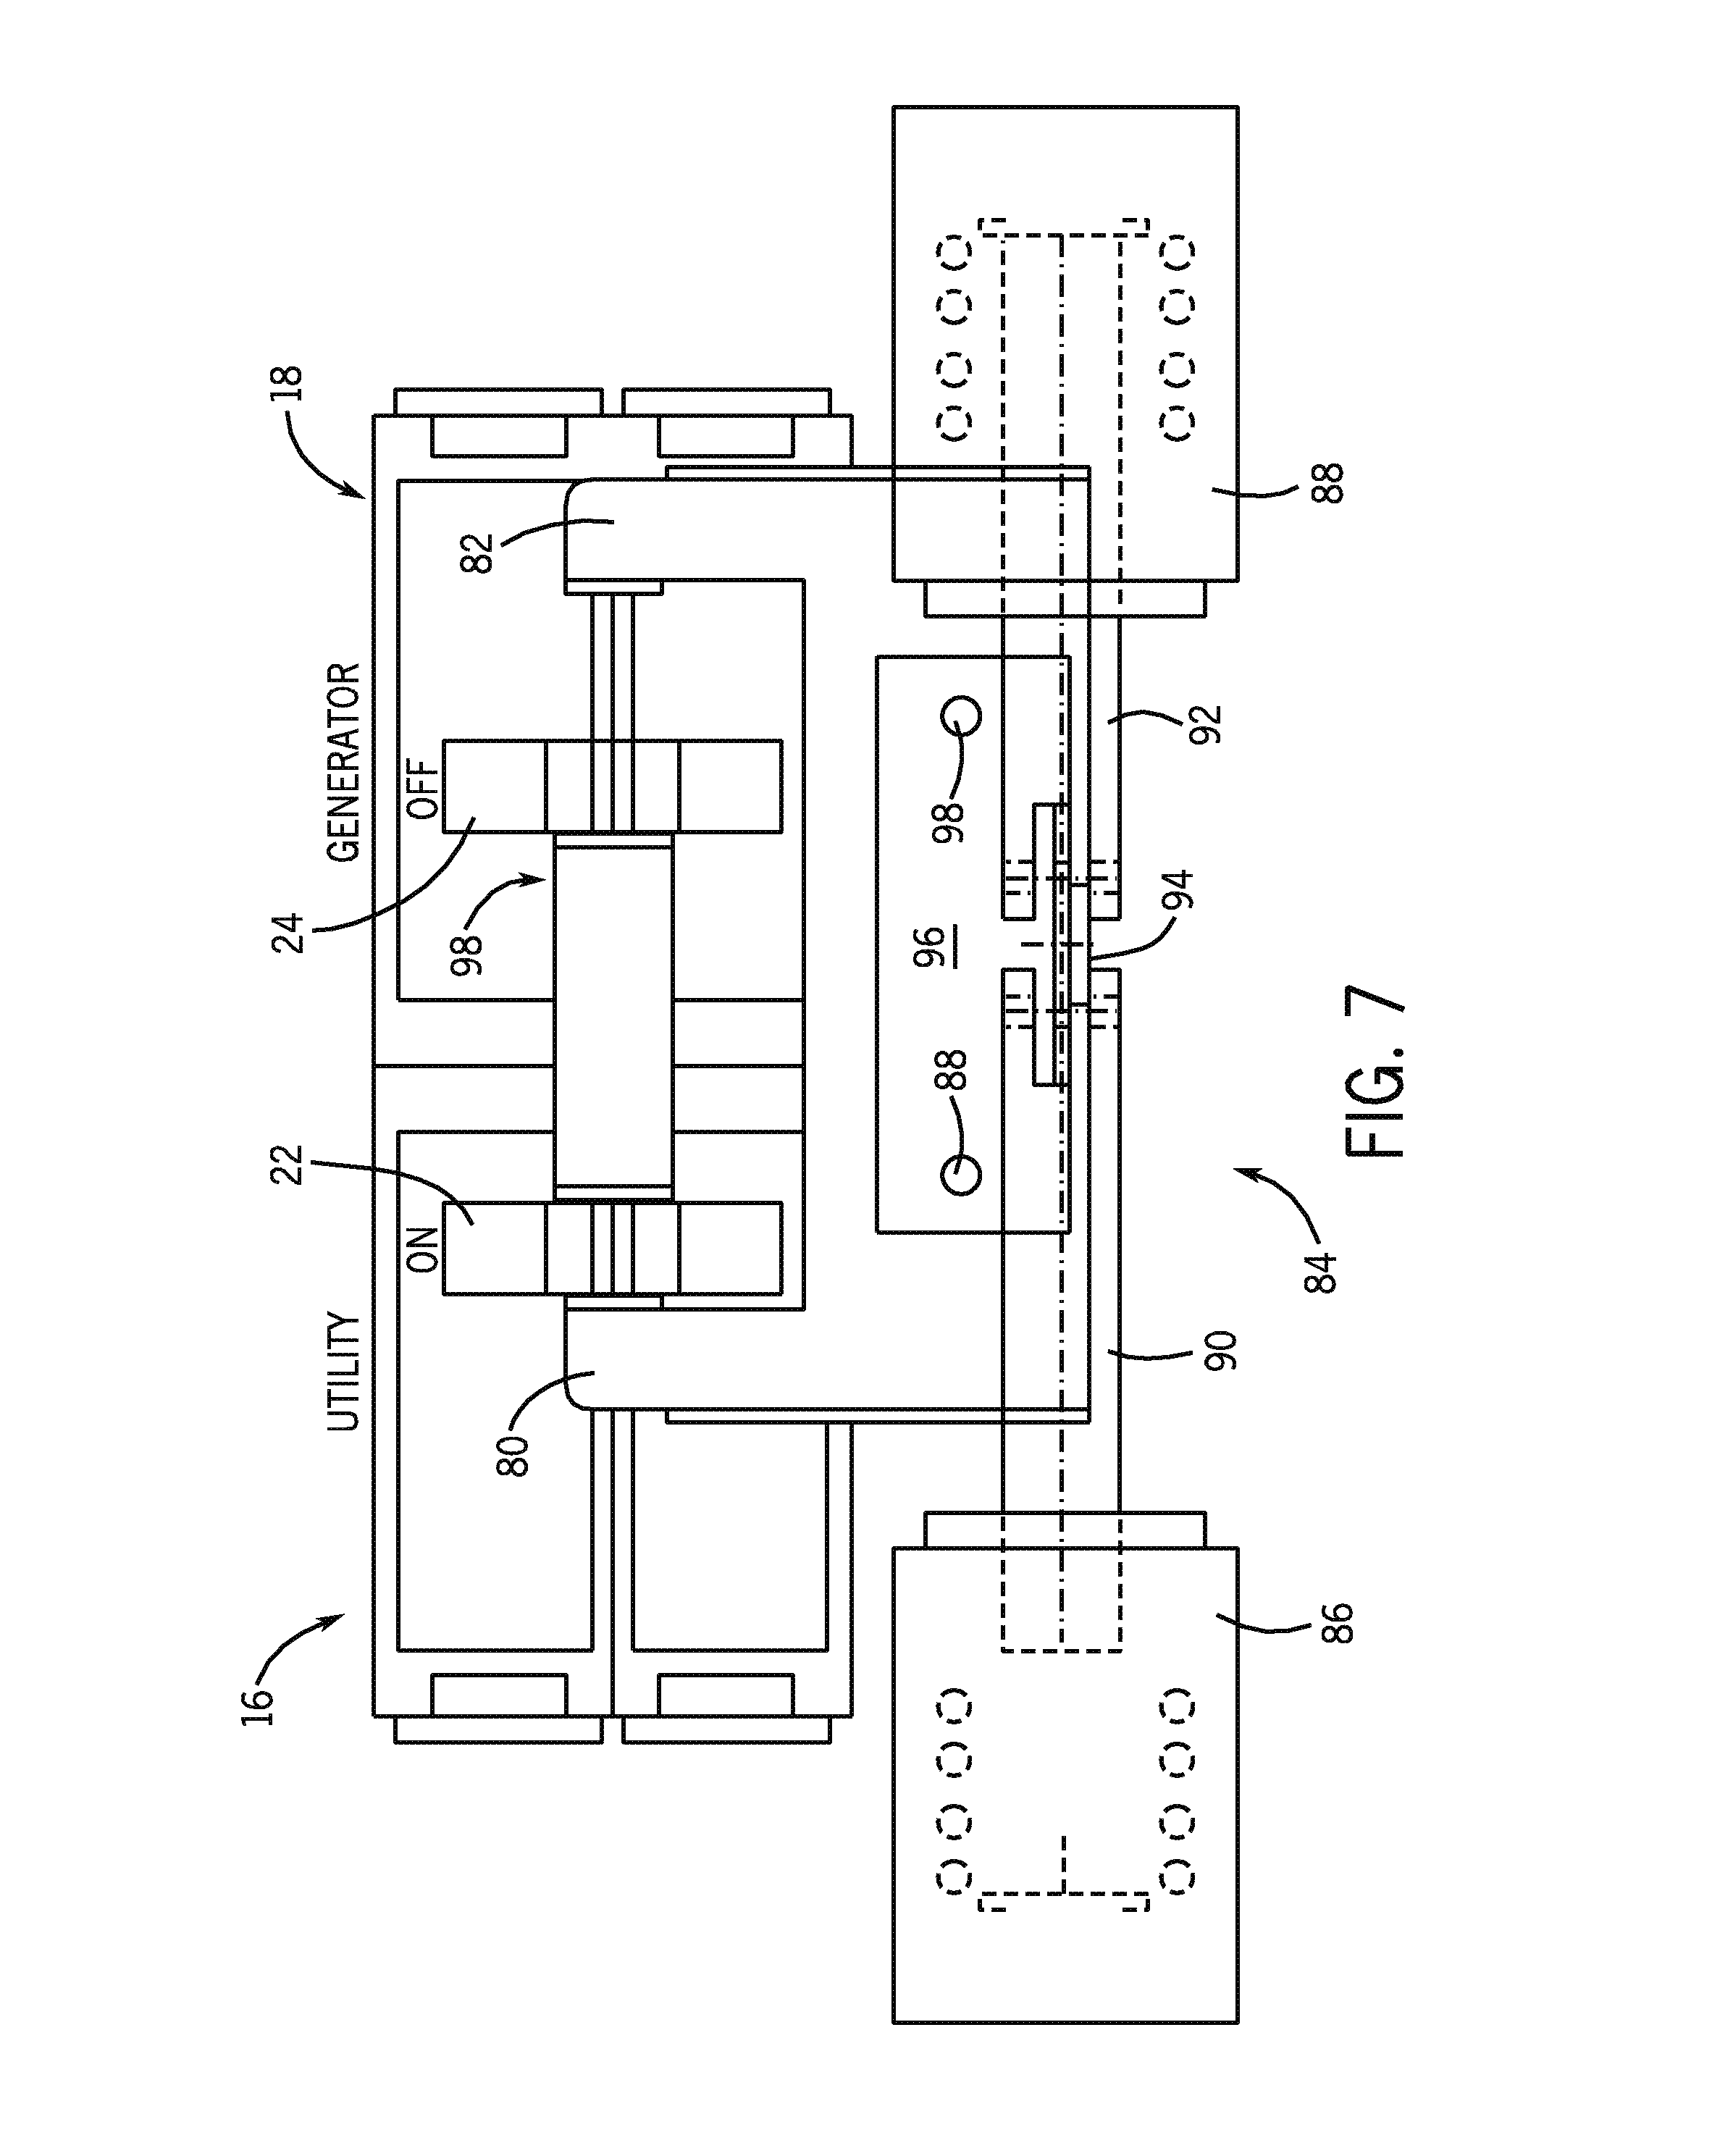 patent us8471659 - automatic transfer switch having an interlock arrangement